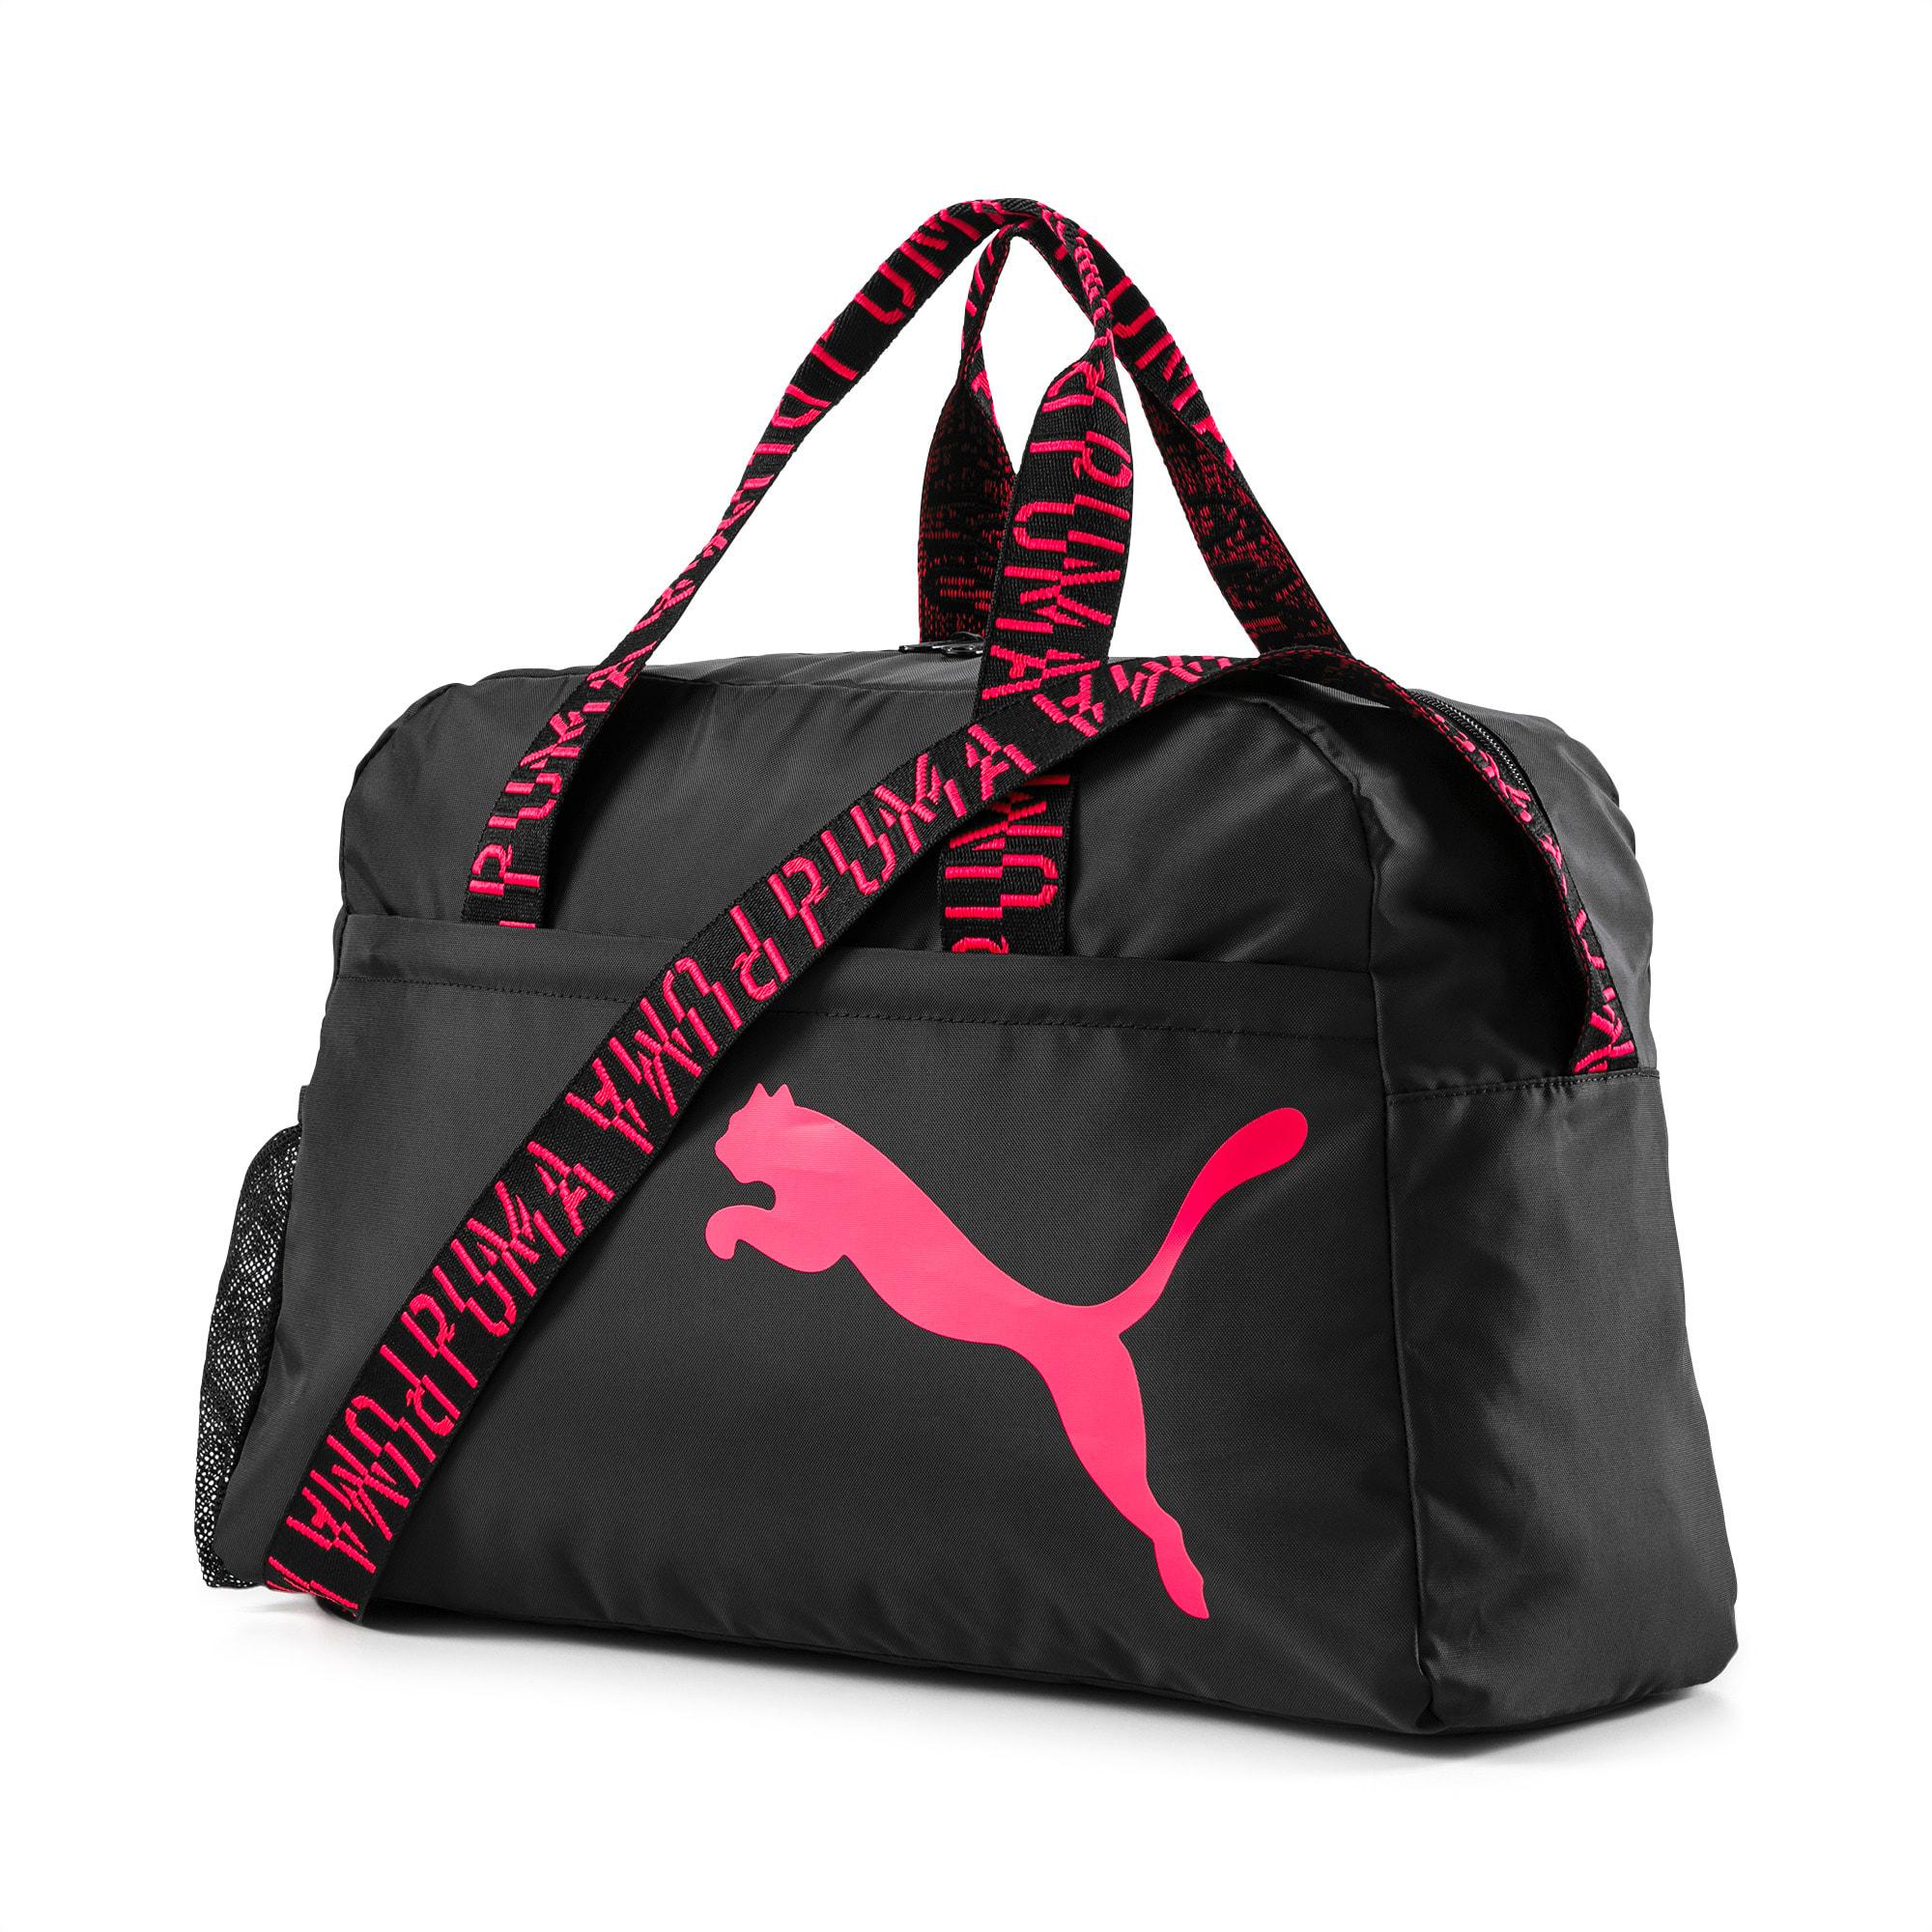 Active Training Essential damessporttas